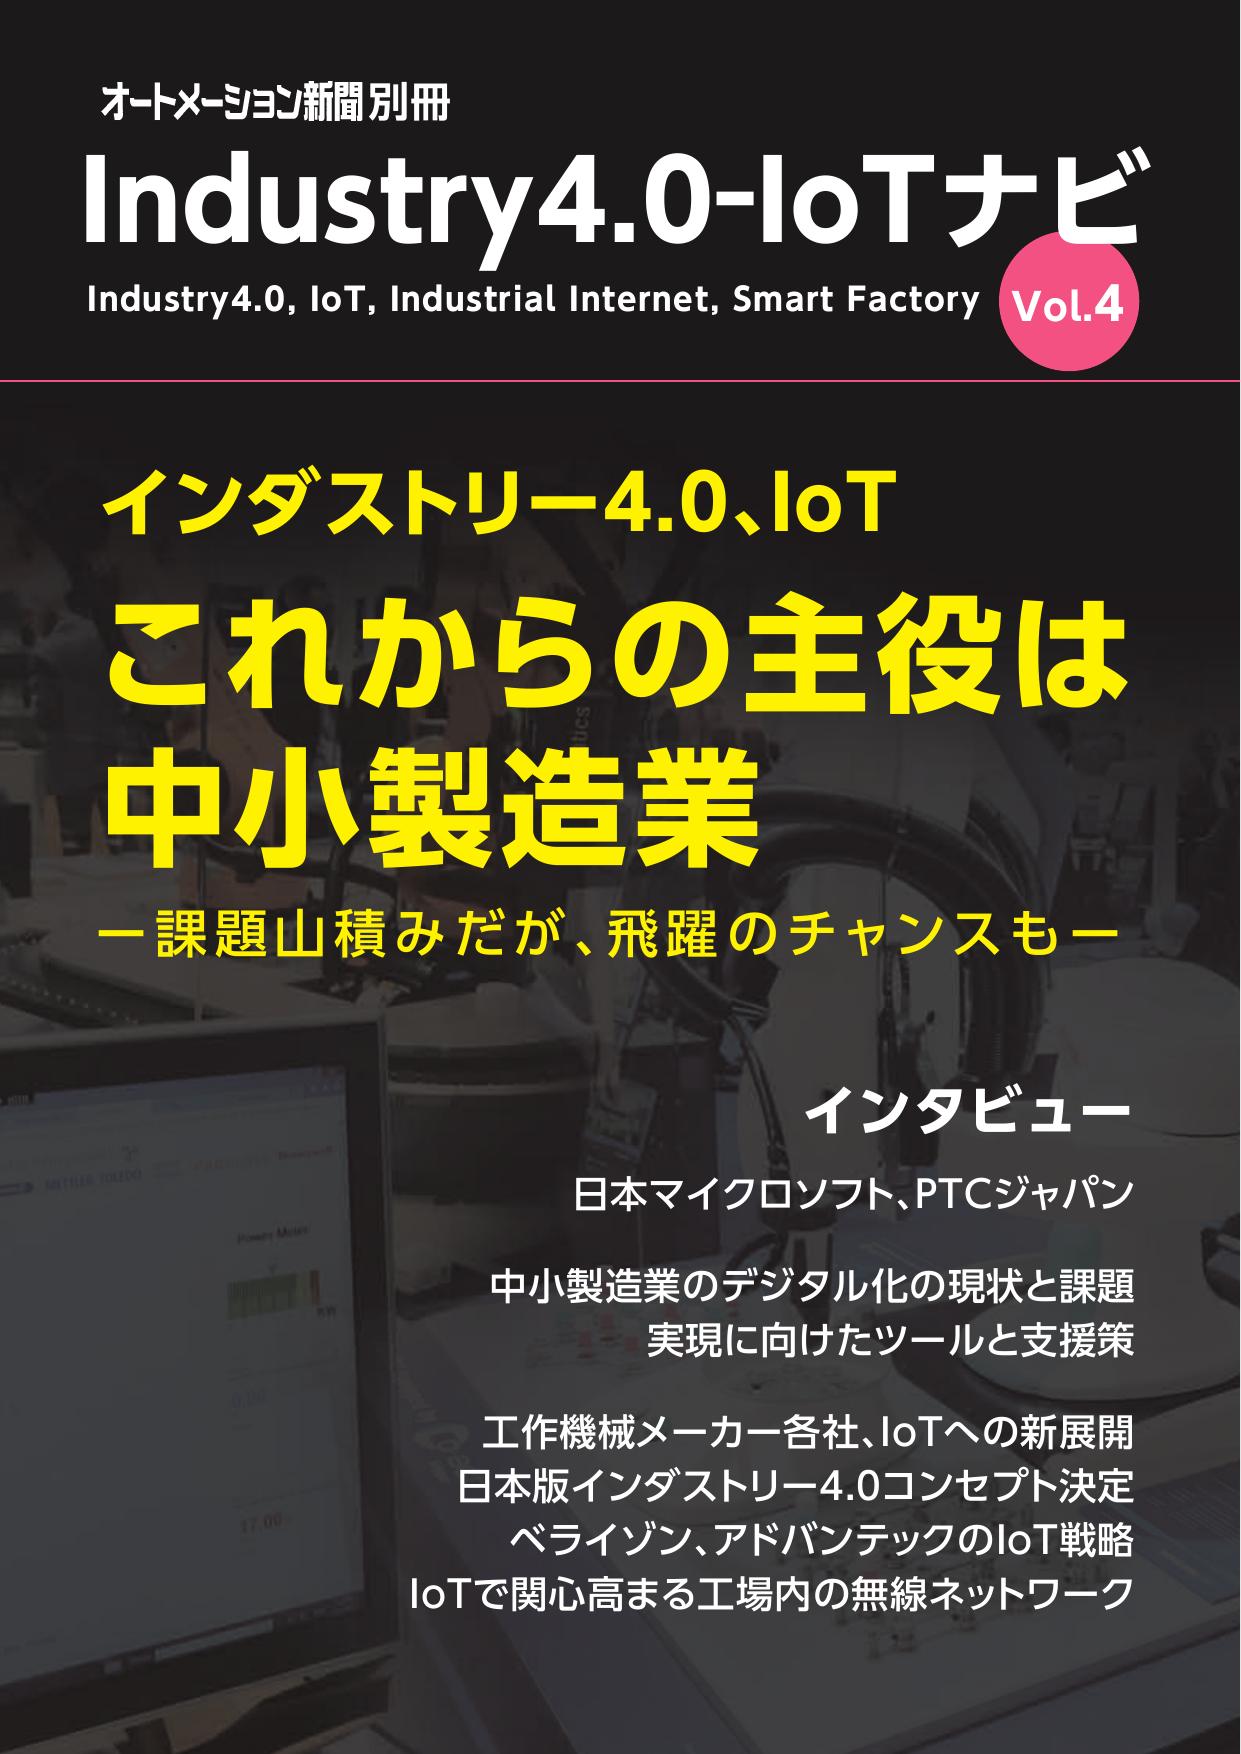 Industory4.0・IoTナビVol.4 ダイジェスト版